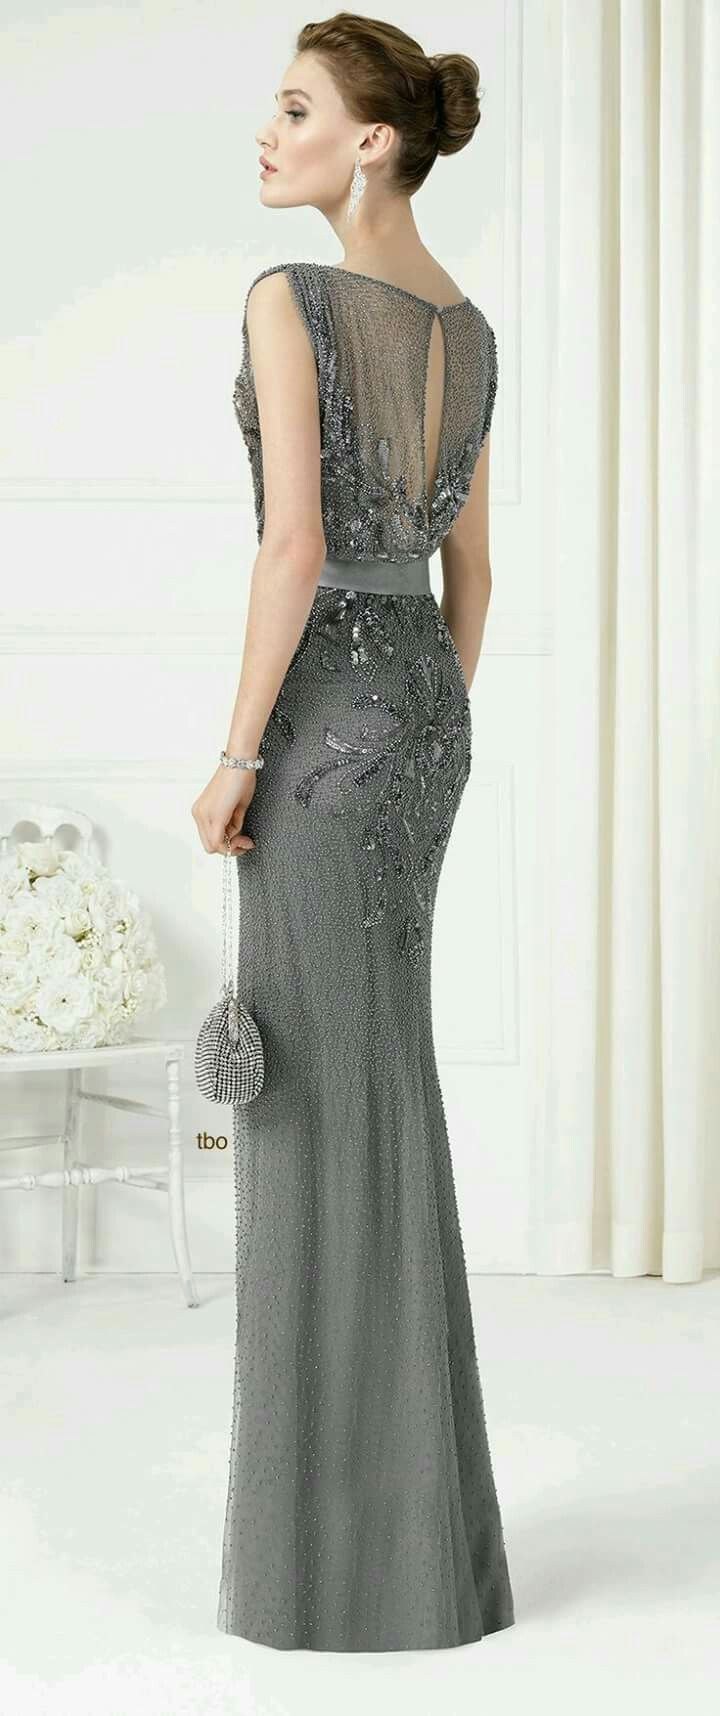 5748d7118 Vestido gris de noche